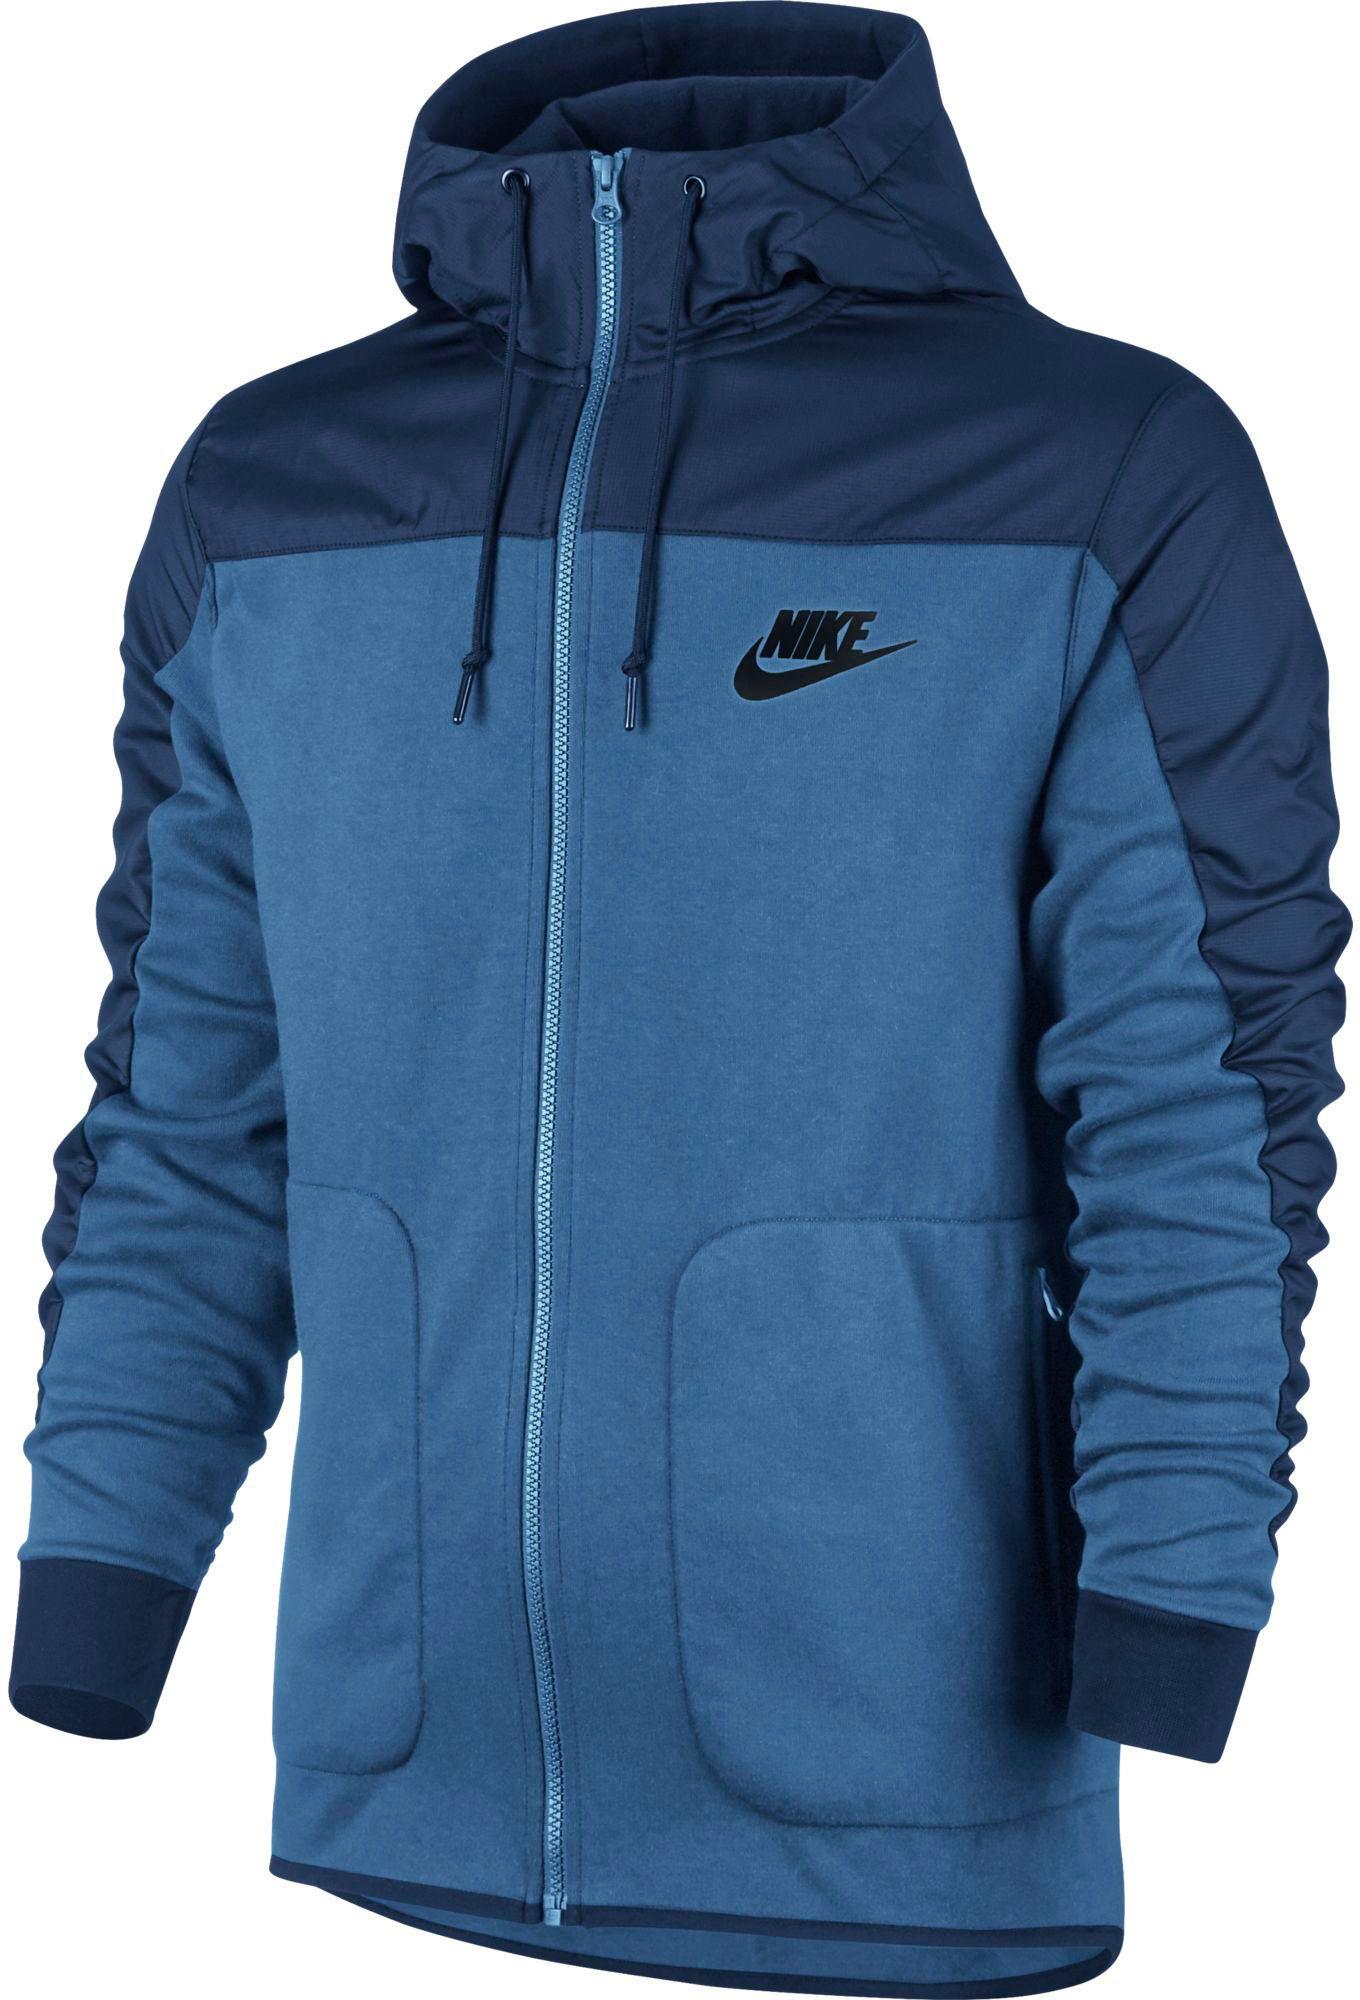 Nike Men's Hoodies & Sweatshirts   DICK'S Sporting Goods